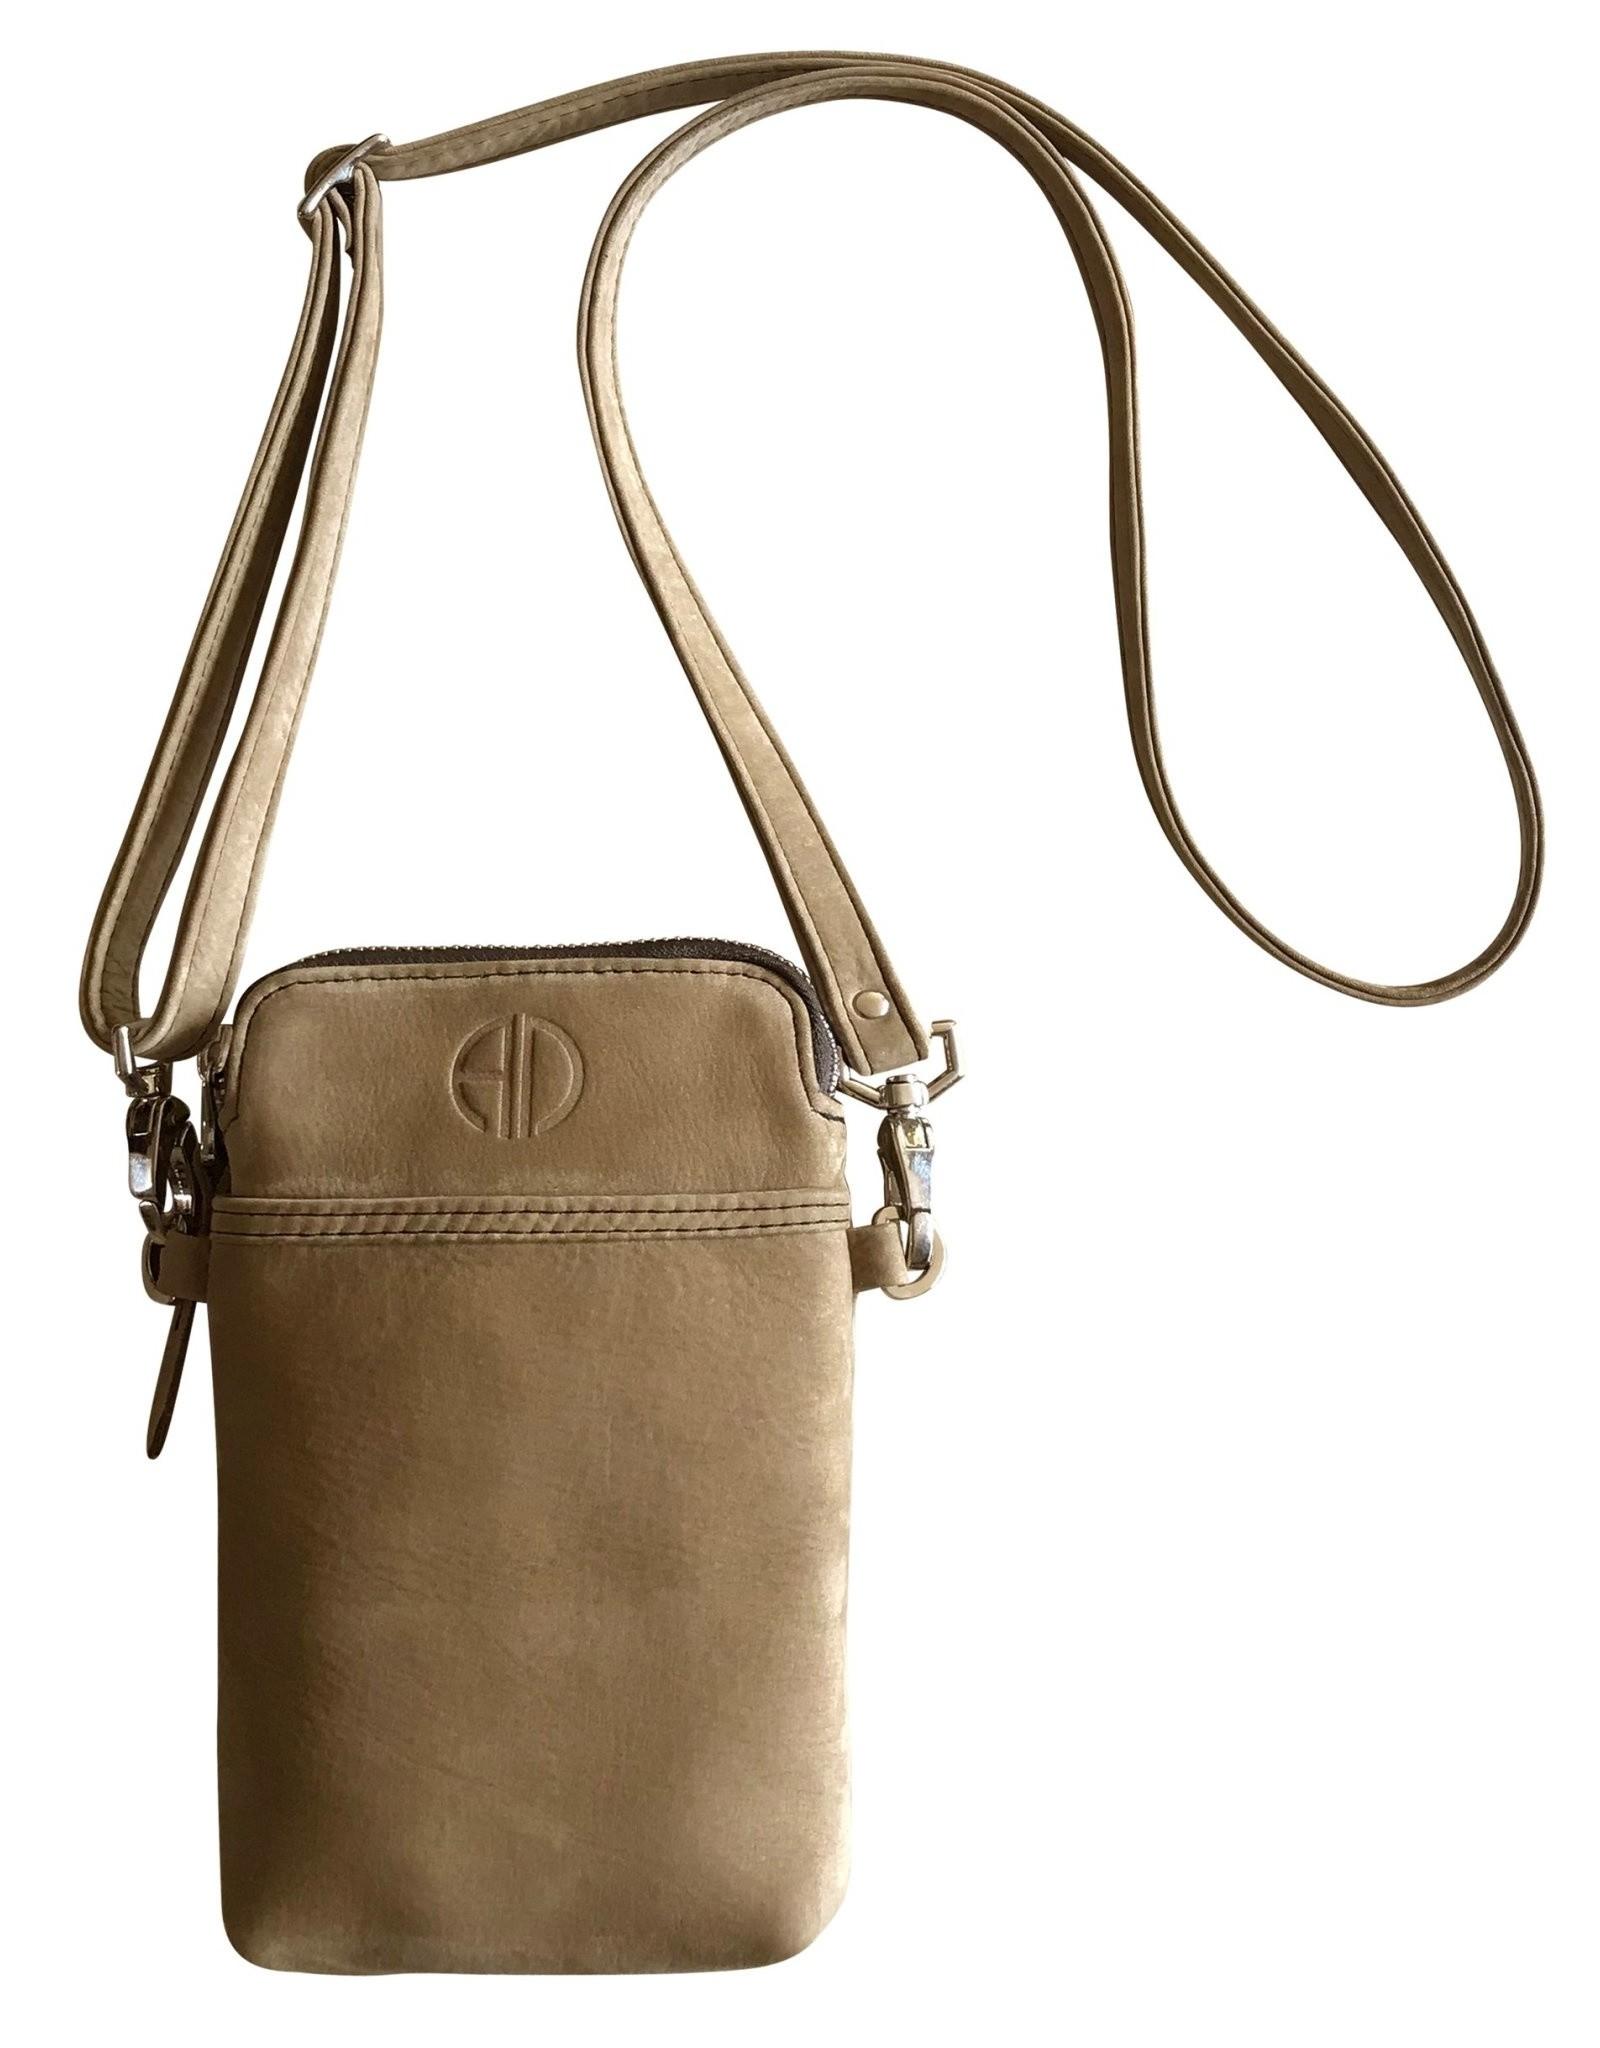 A Handmade Designs THE PASSPORT Crossbody Bag